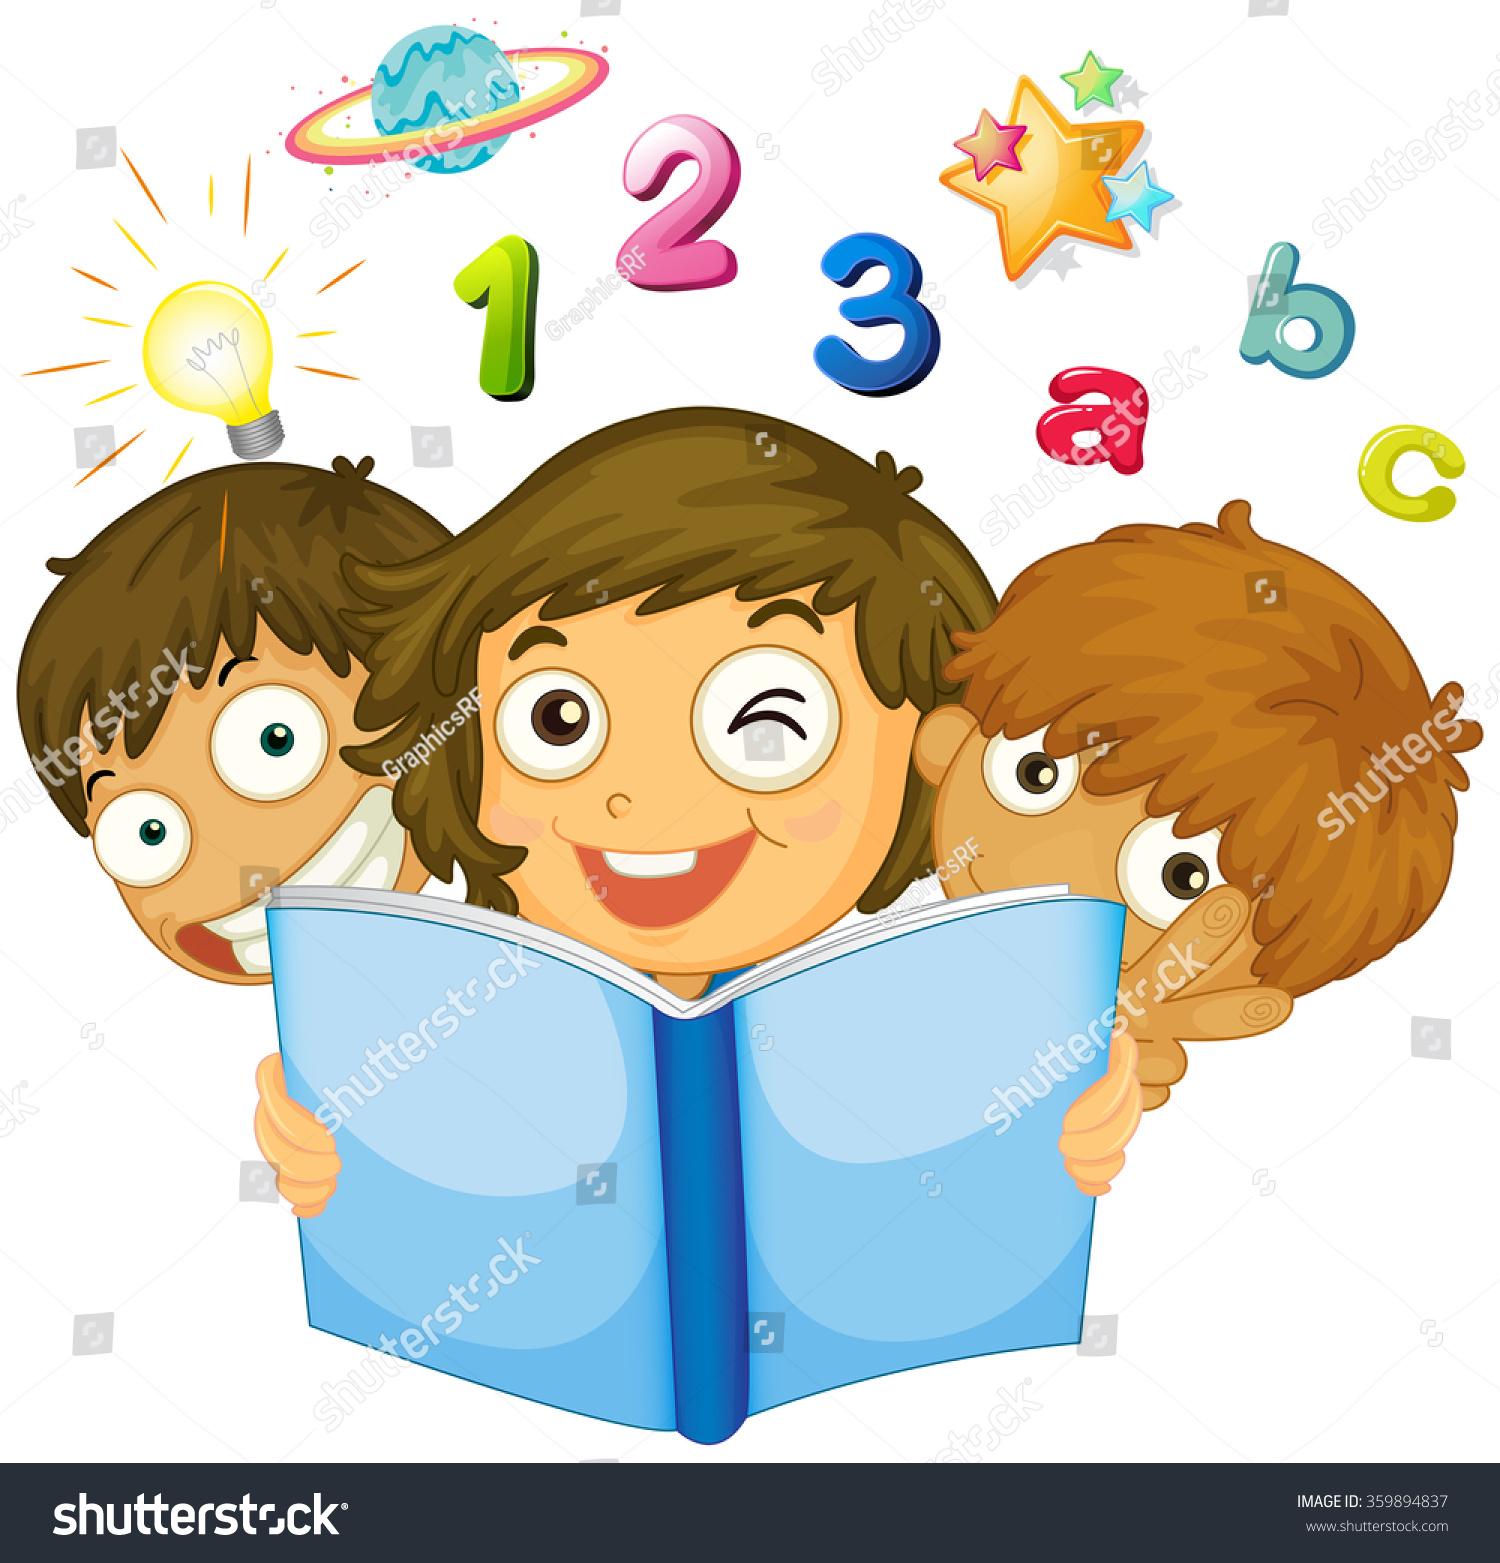 Worksheet Math Reading worksheet math reading mikyu free children book illustration stock vector 359894837 illustration